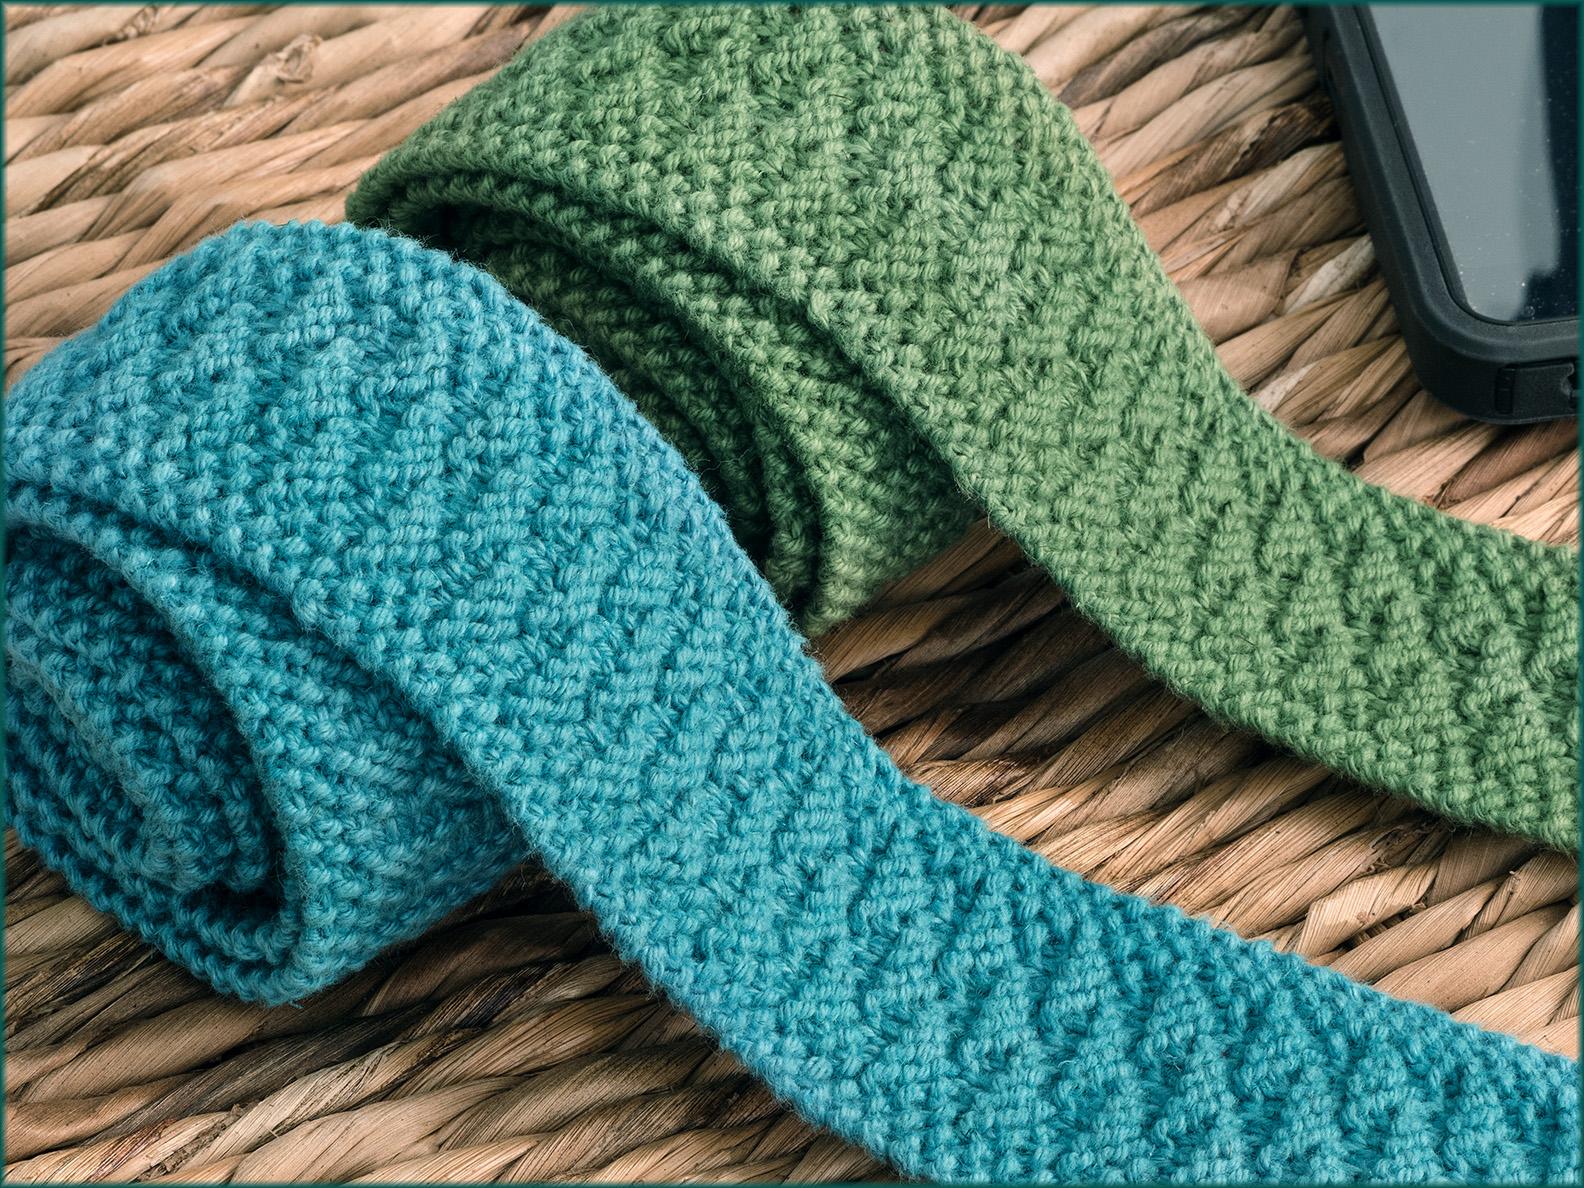 Wyndlestraw Designs: New pattern - Okehampton Tie